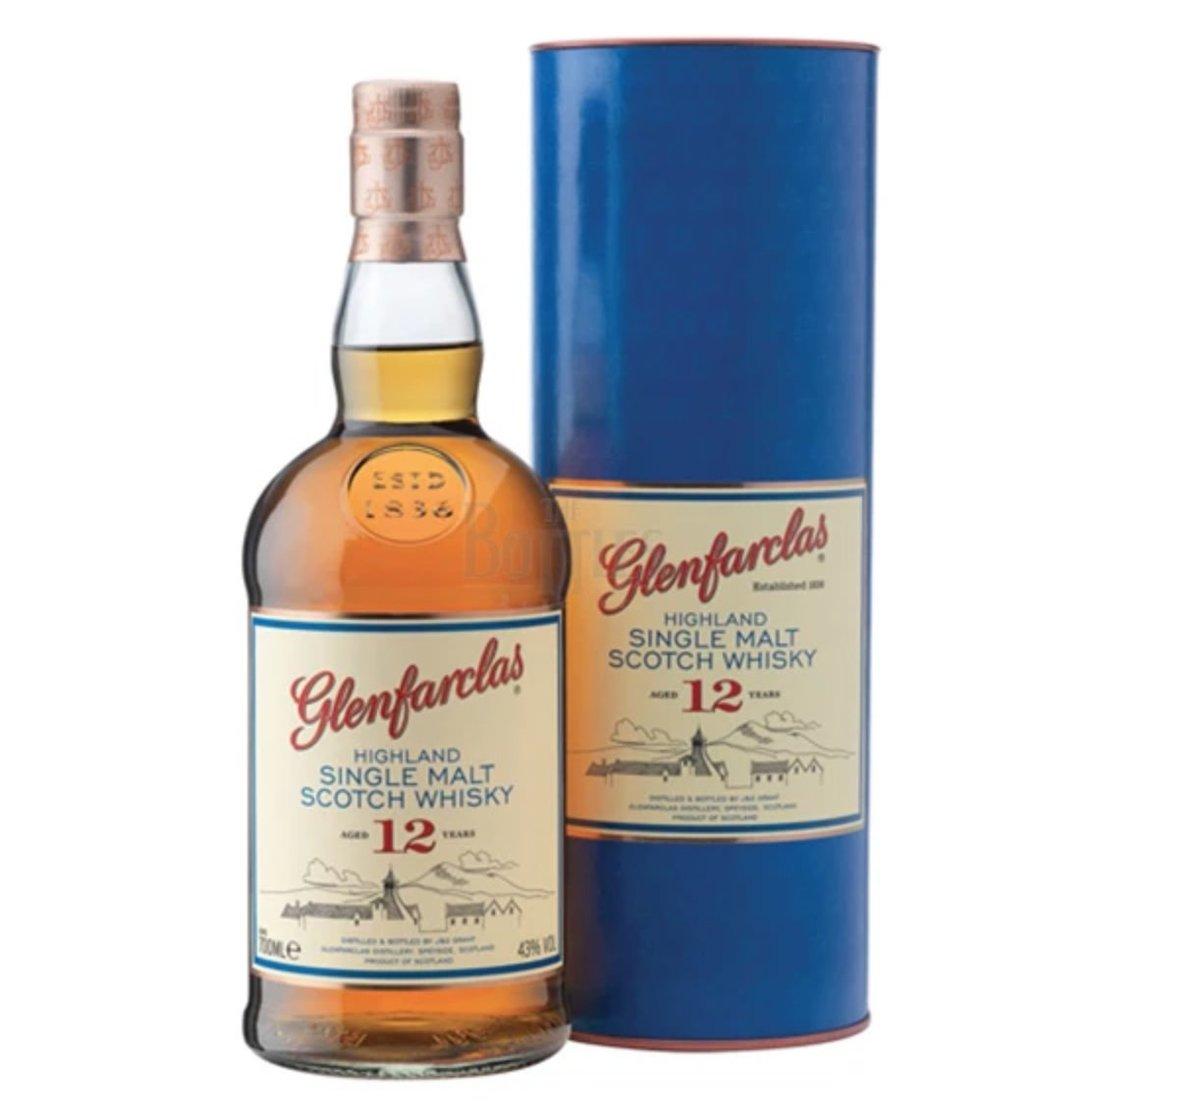 Glenfarclas 12 Years Old Highland Single Malt Whisky